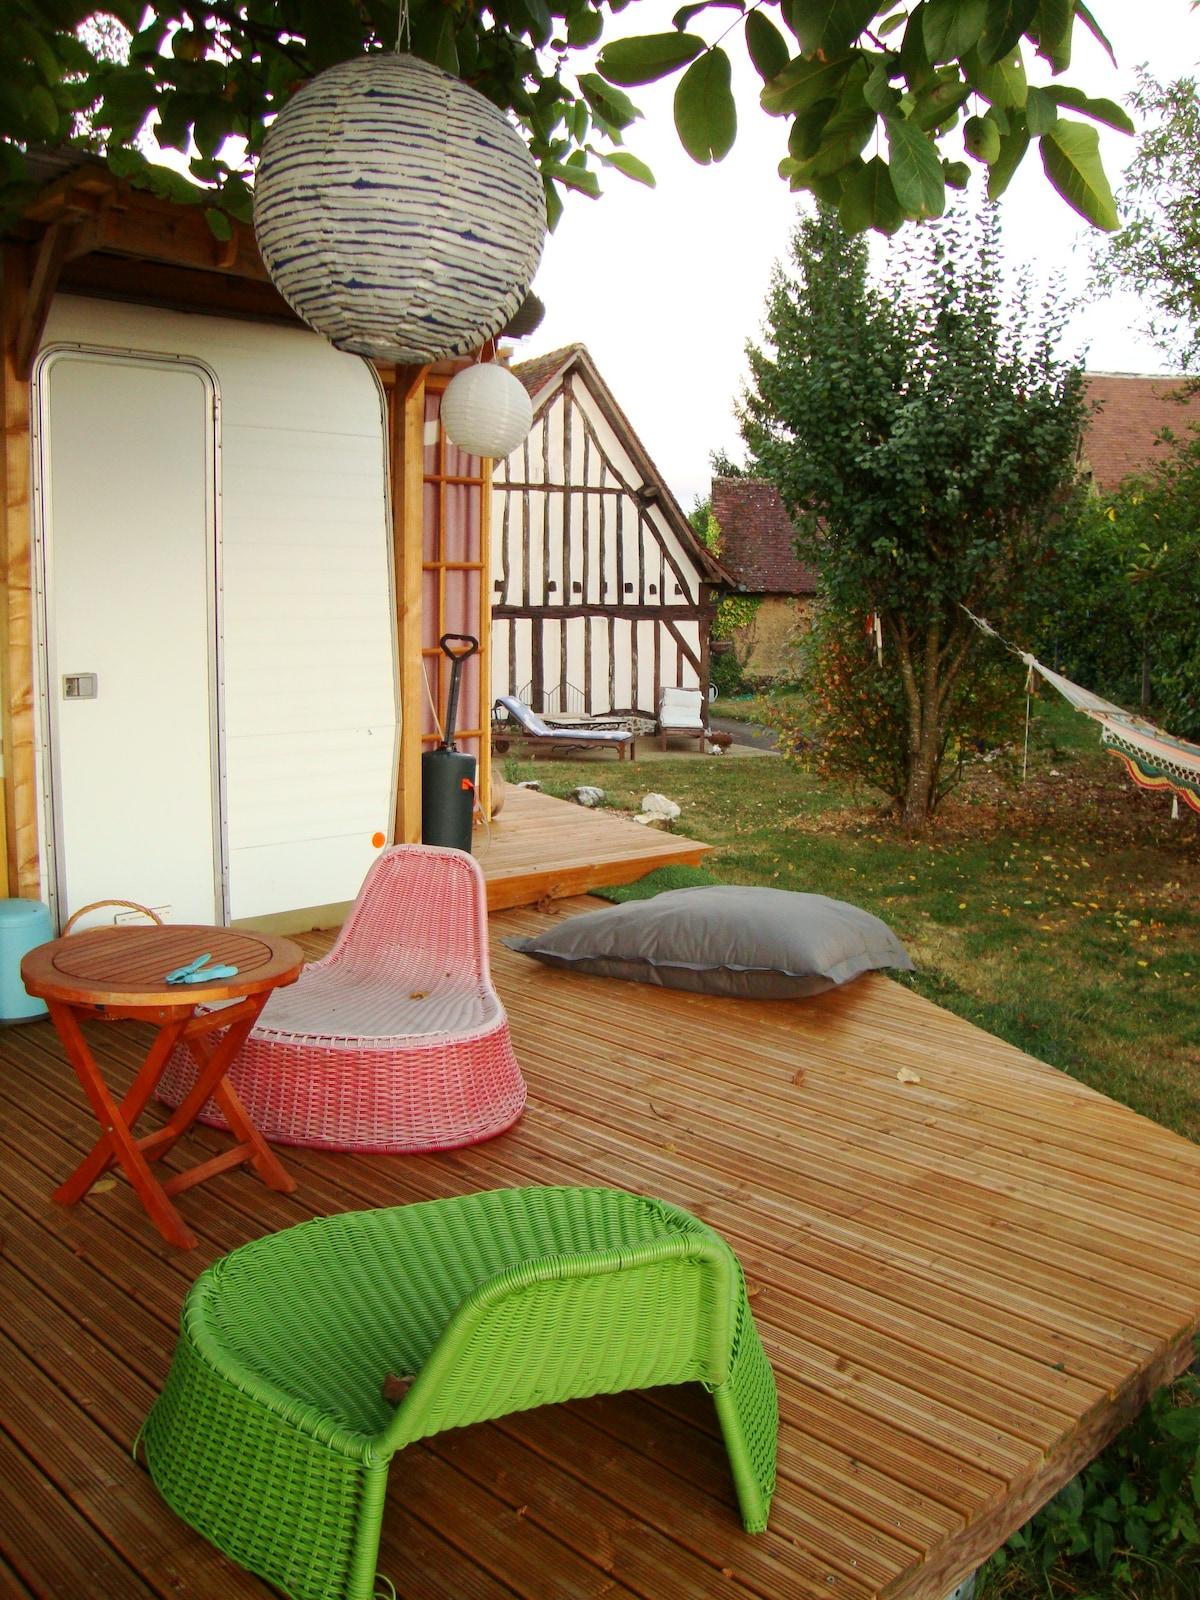 Montigny Le Chartif 2018 (mit Fotos): Top 20 Ferienwohnungen Montigny Le Chartif,  Ferienhäuser, Unterkünfte U0026 Apartments   Airbnb Montigny Le Chartif, ...